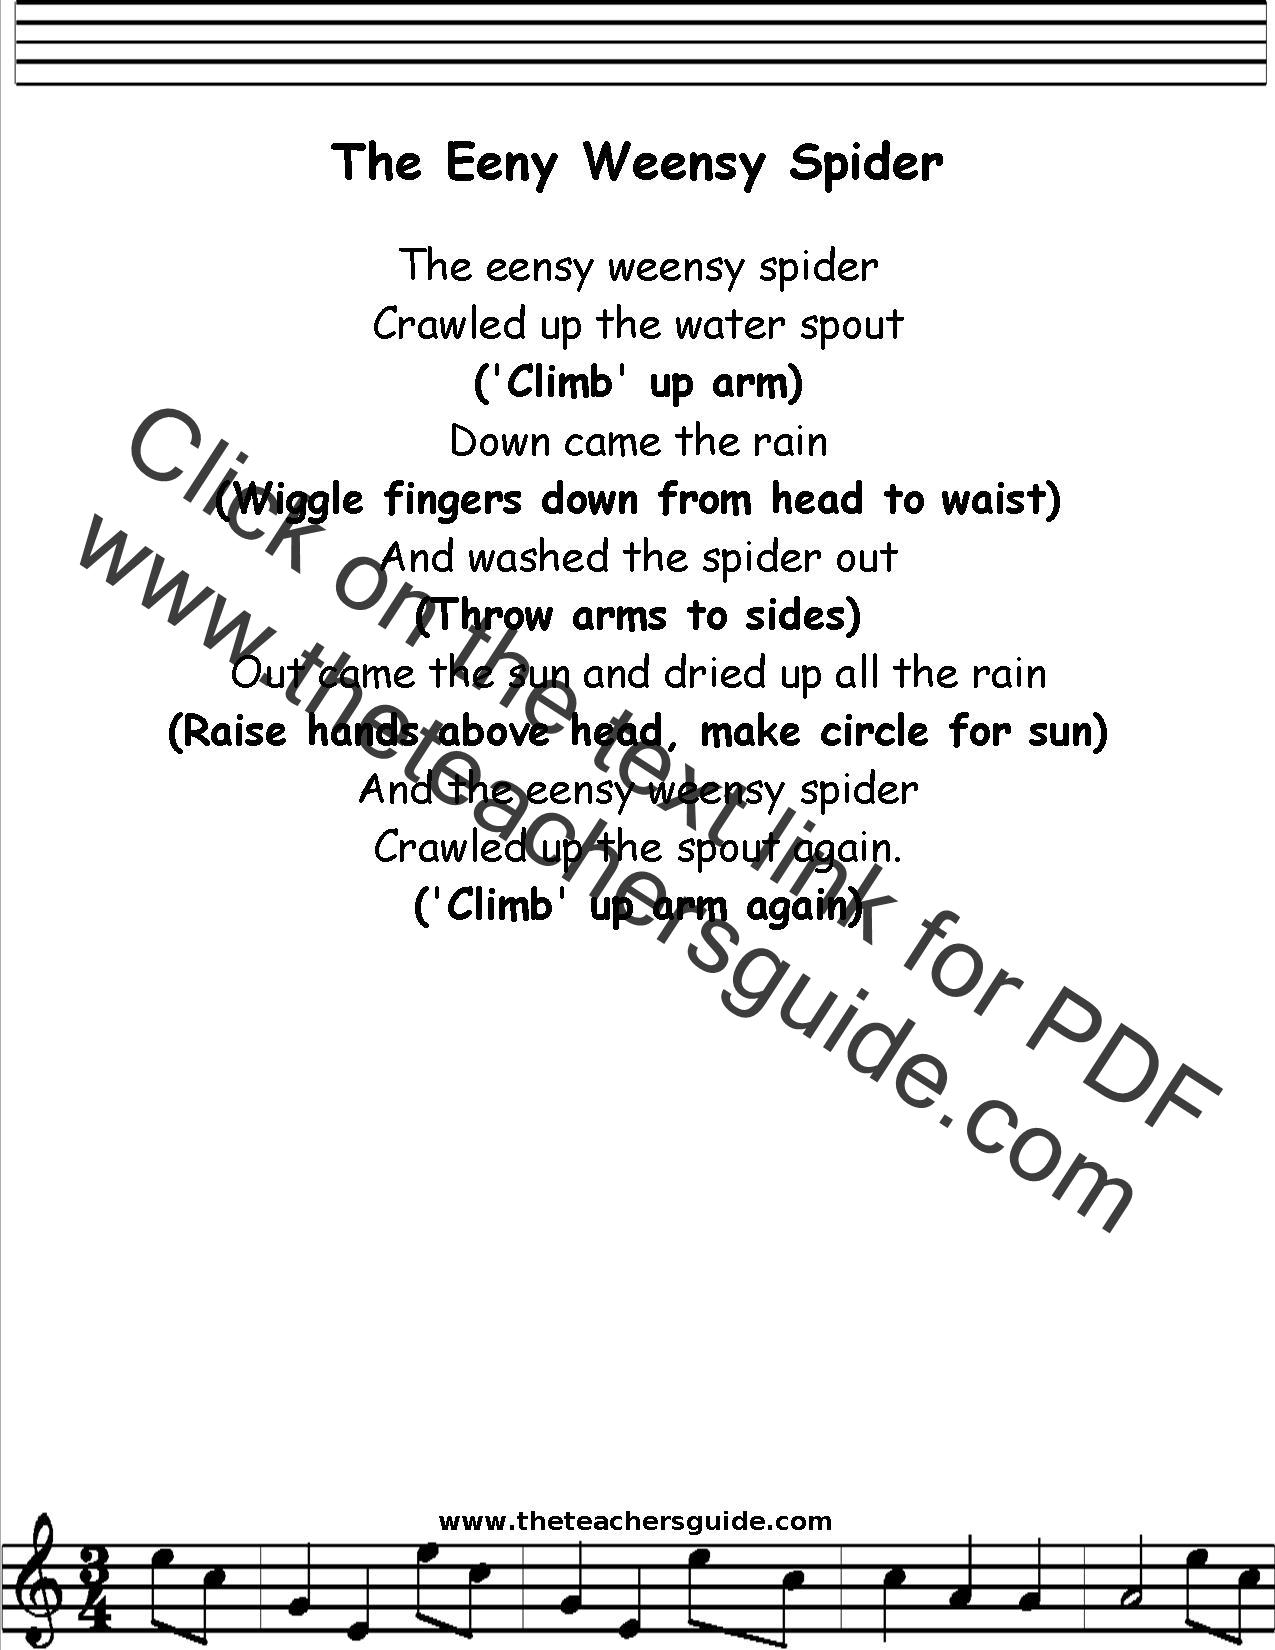 Eensy Weensy Spider Lyrics, Printout, MIDI, and Video